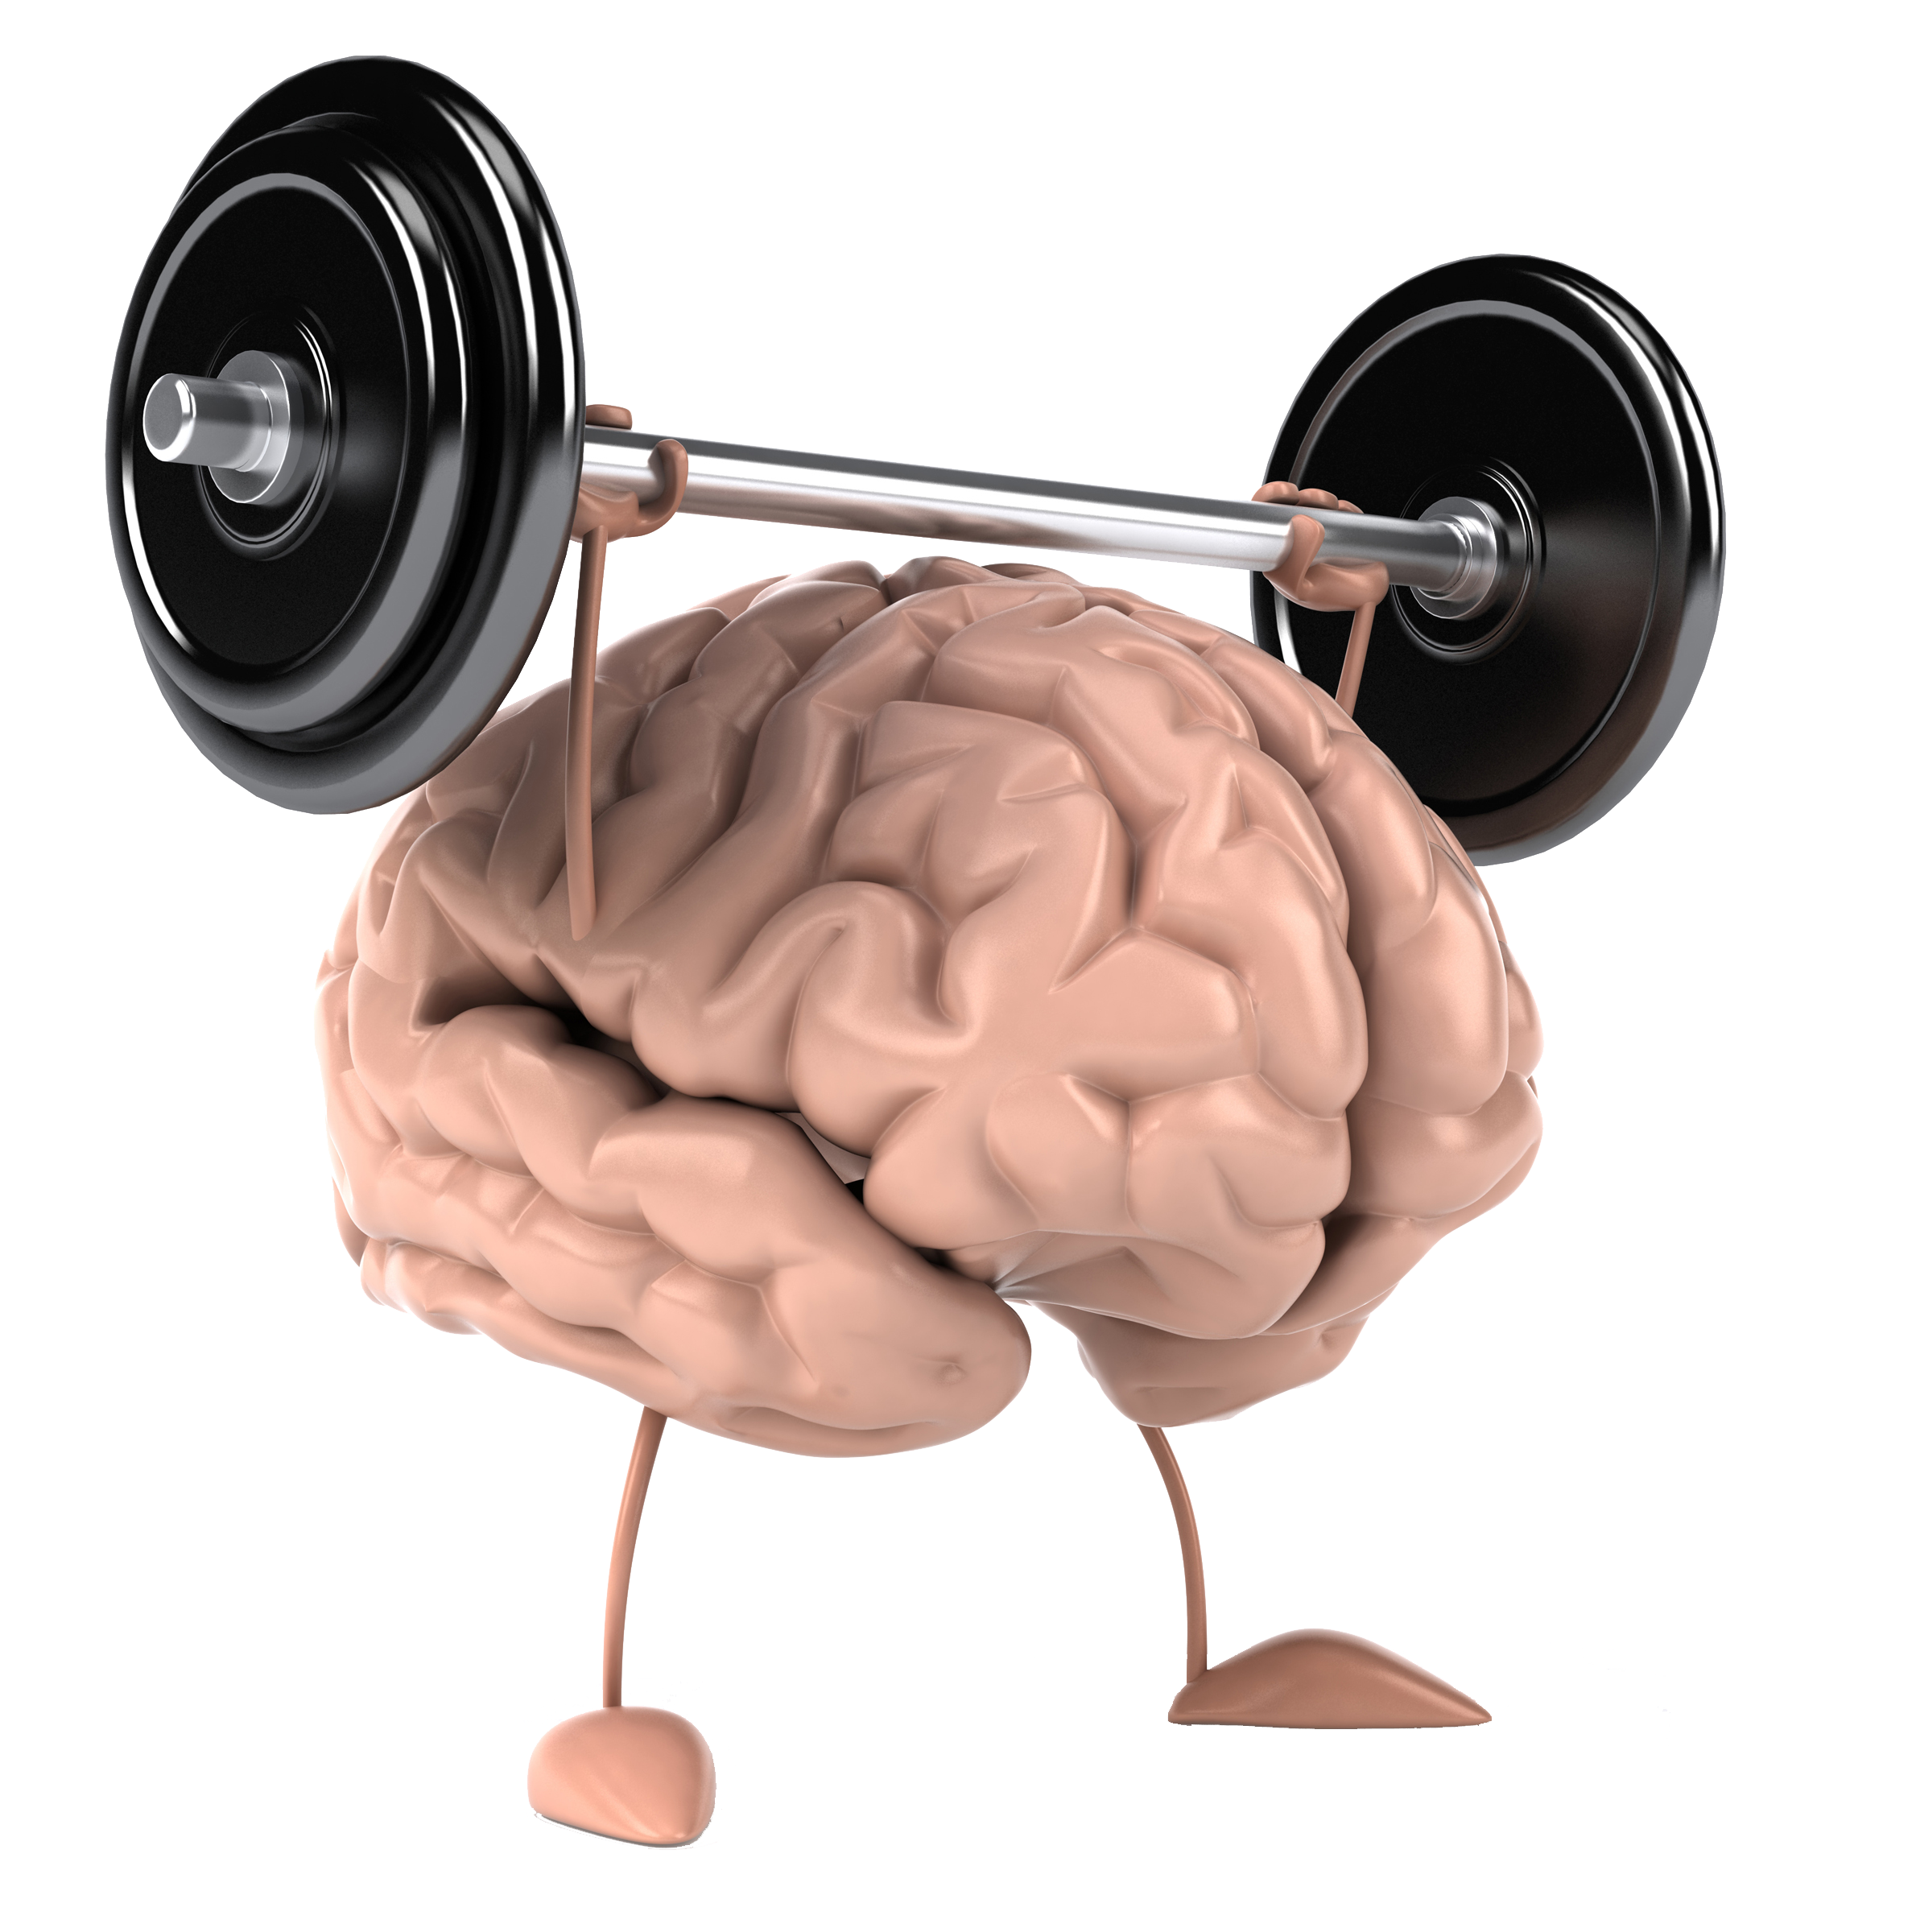 Exercising clipart brain exercise. Online coaching trial bridge